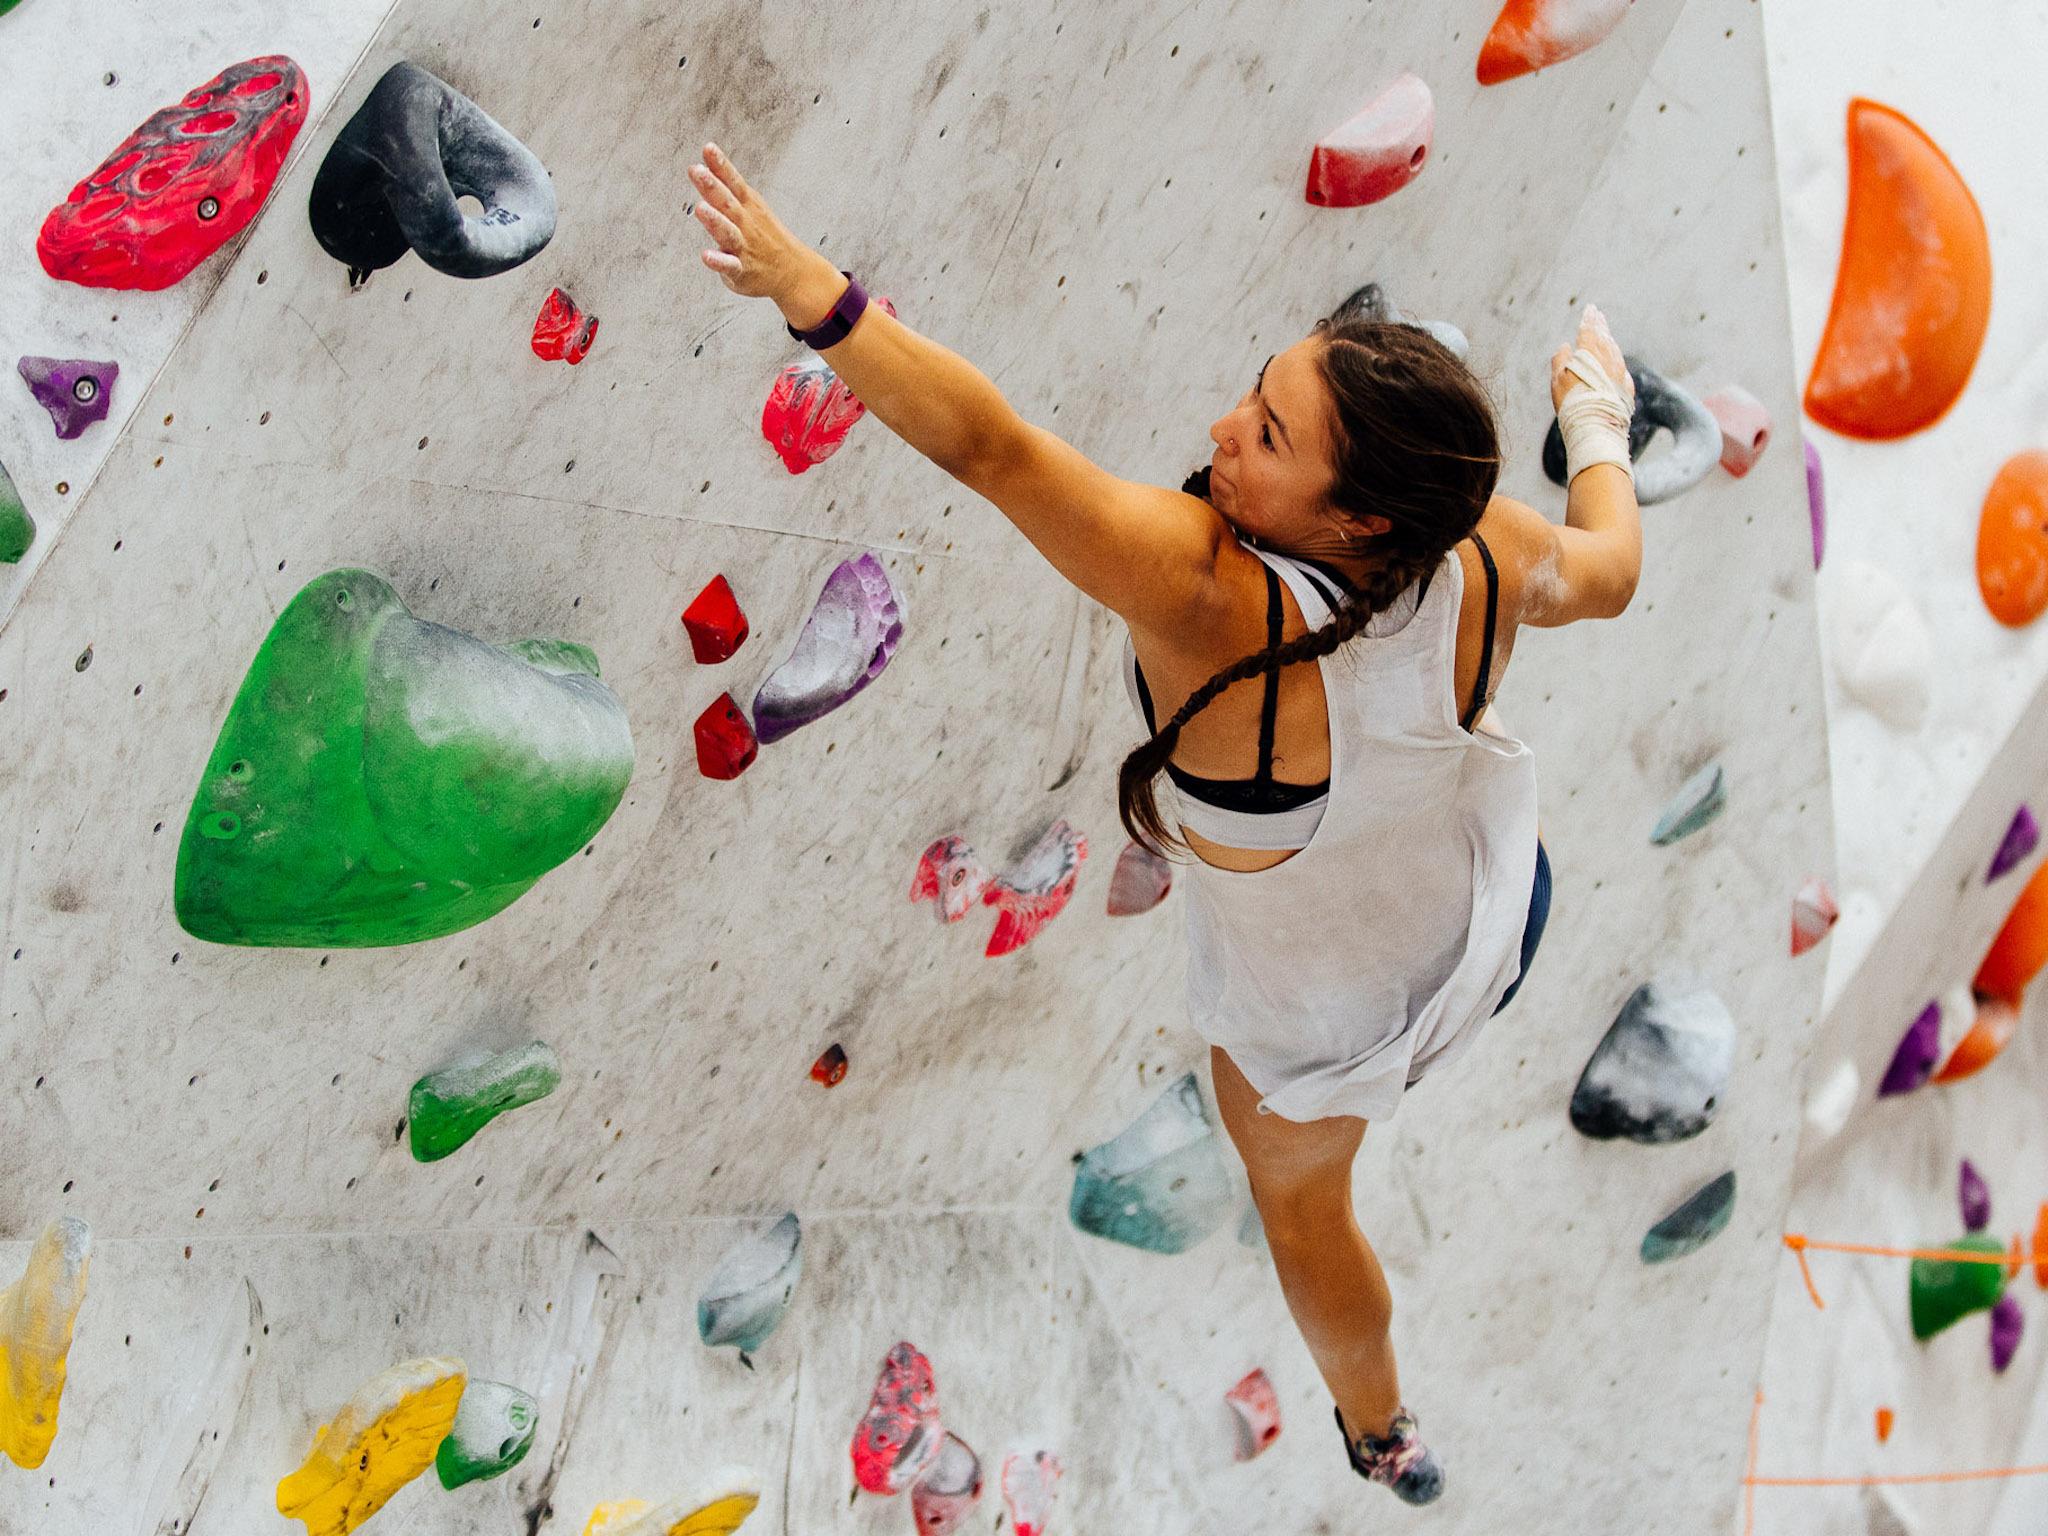 Bouldering, Rock Climbing, Woman climbing